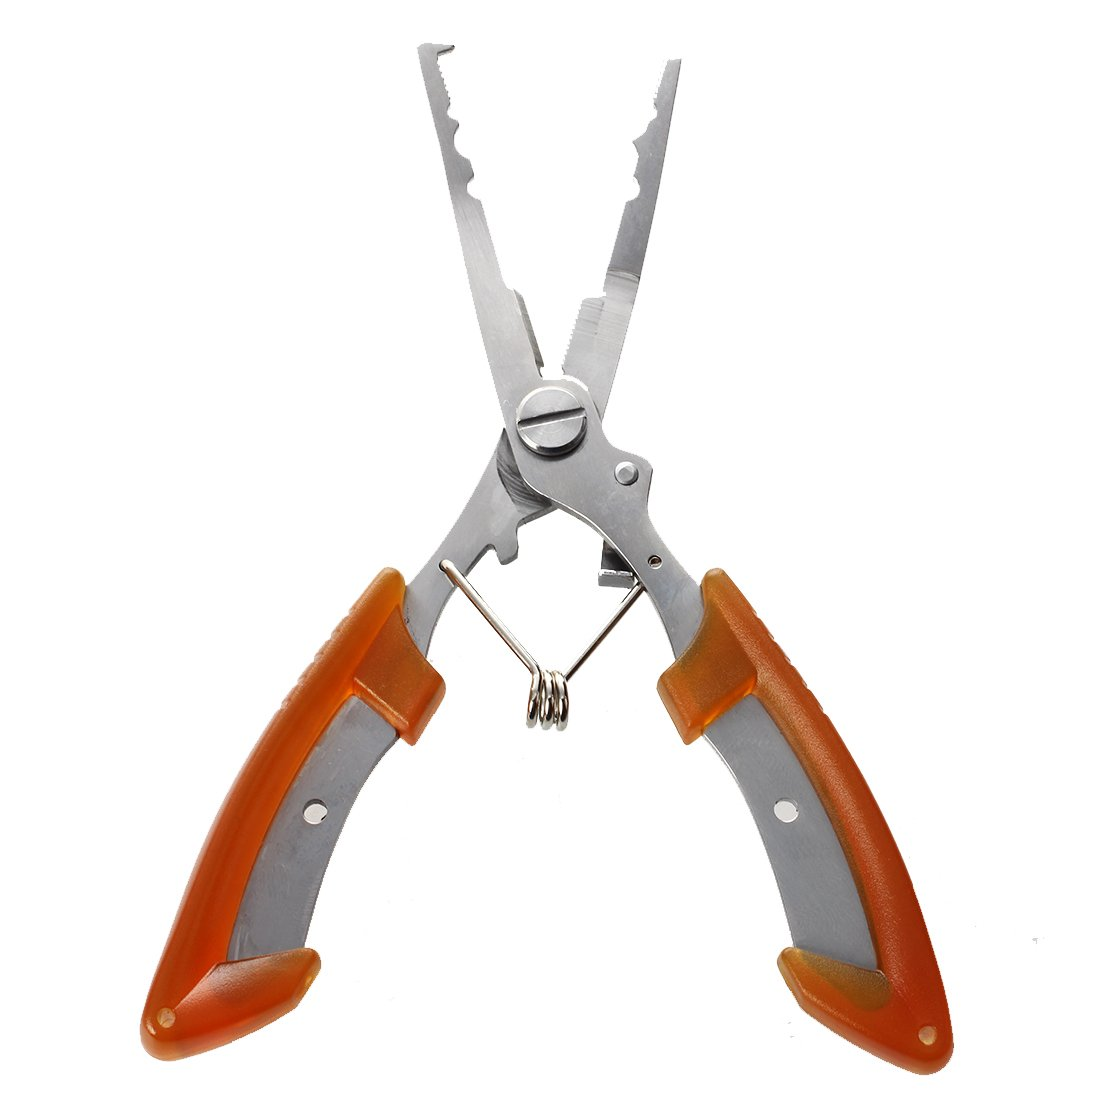 TOOGOO(R)16cm Alicates Tijeras herramienta de corte de linea de pesca de acero inoxidable Naranja